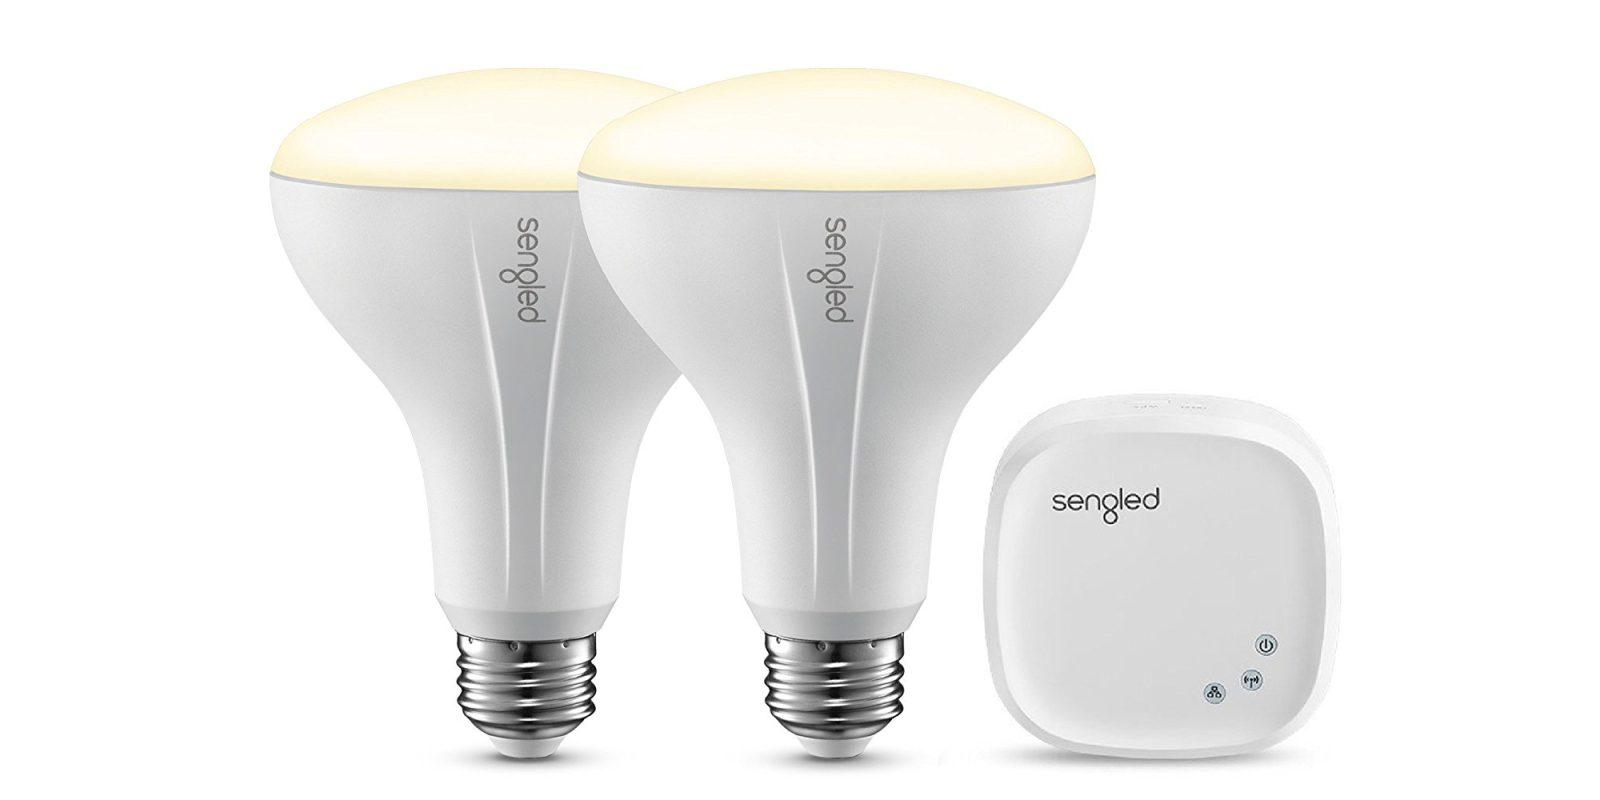 Sengleds Br30 Smart Led Light Bulb Starter Kit Falls Within 2 Of Fluorescent Lamp Lights All Time Low At 5050